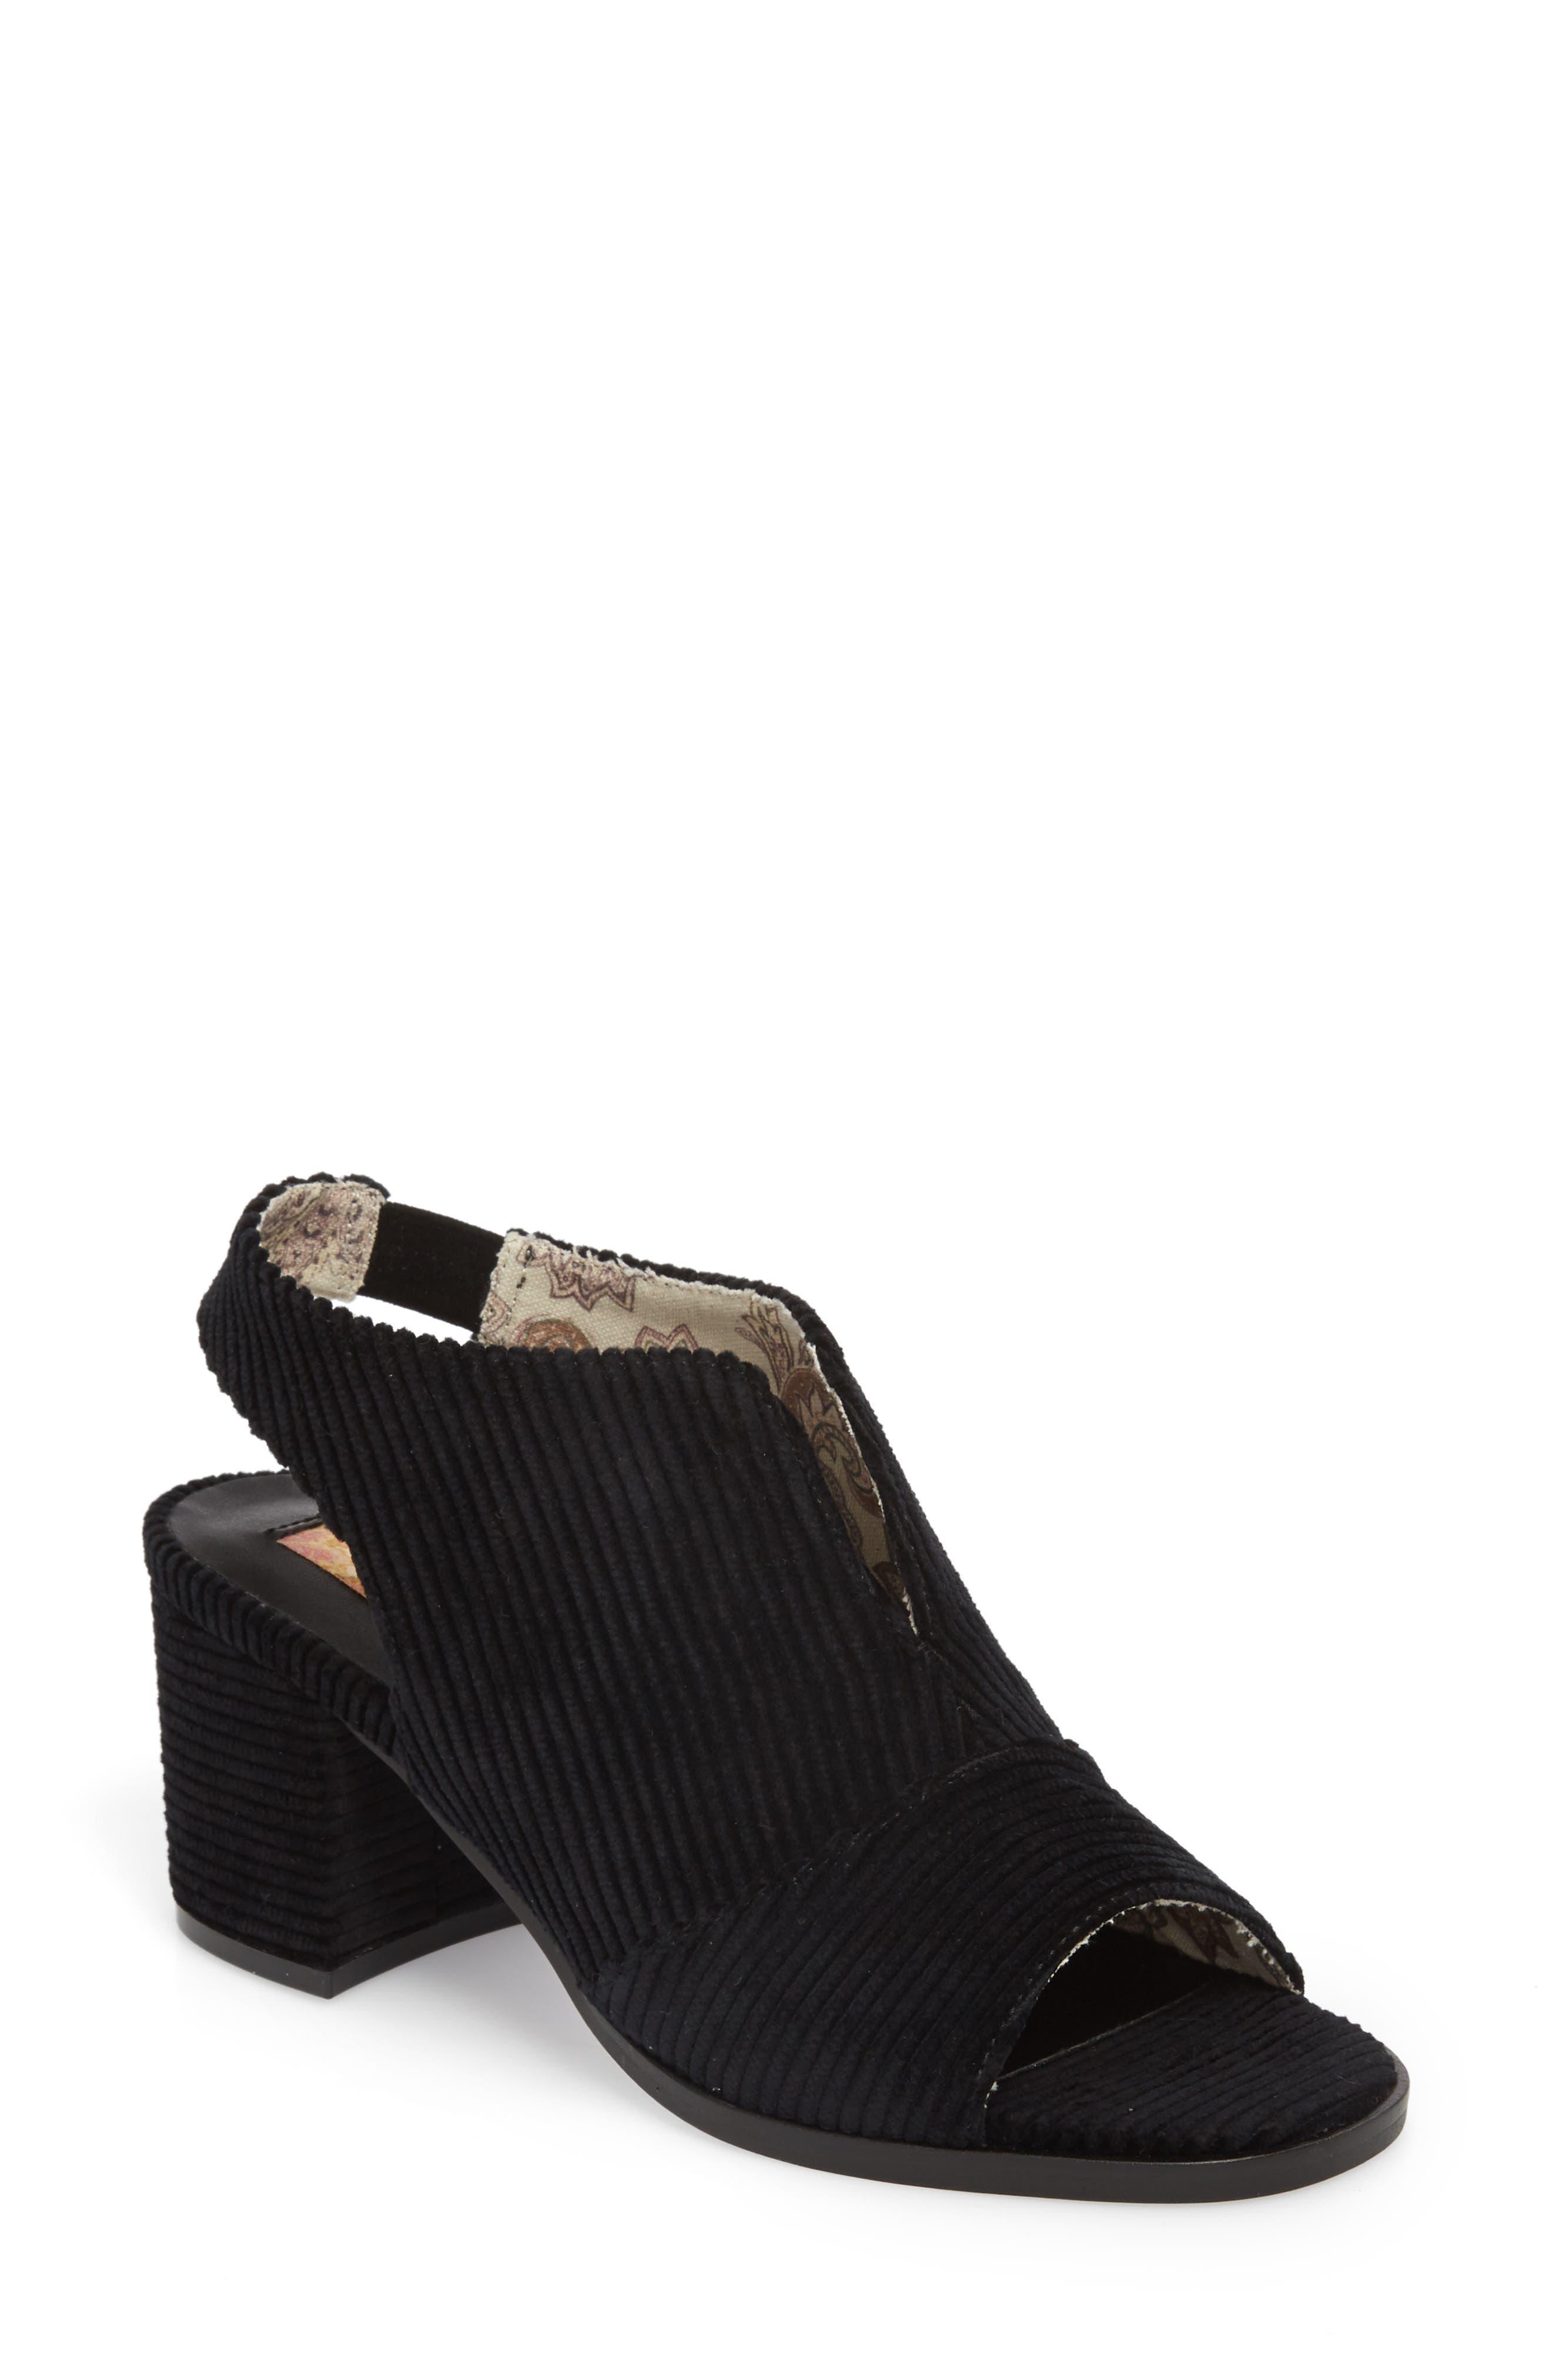 Jordan Sandal,                         Main,                         color, Corduroy Black